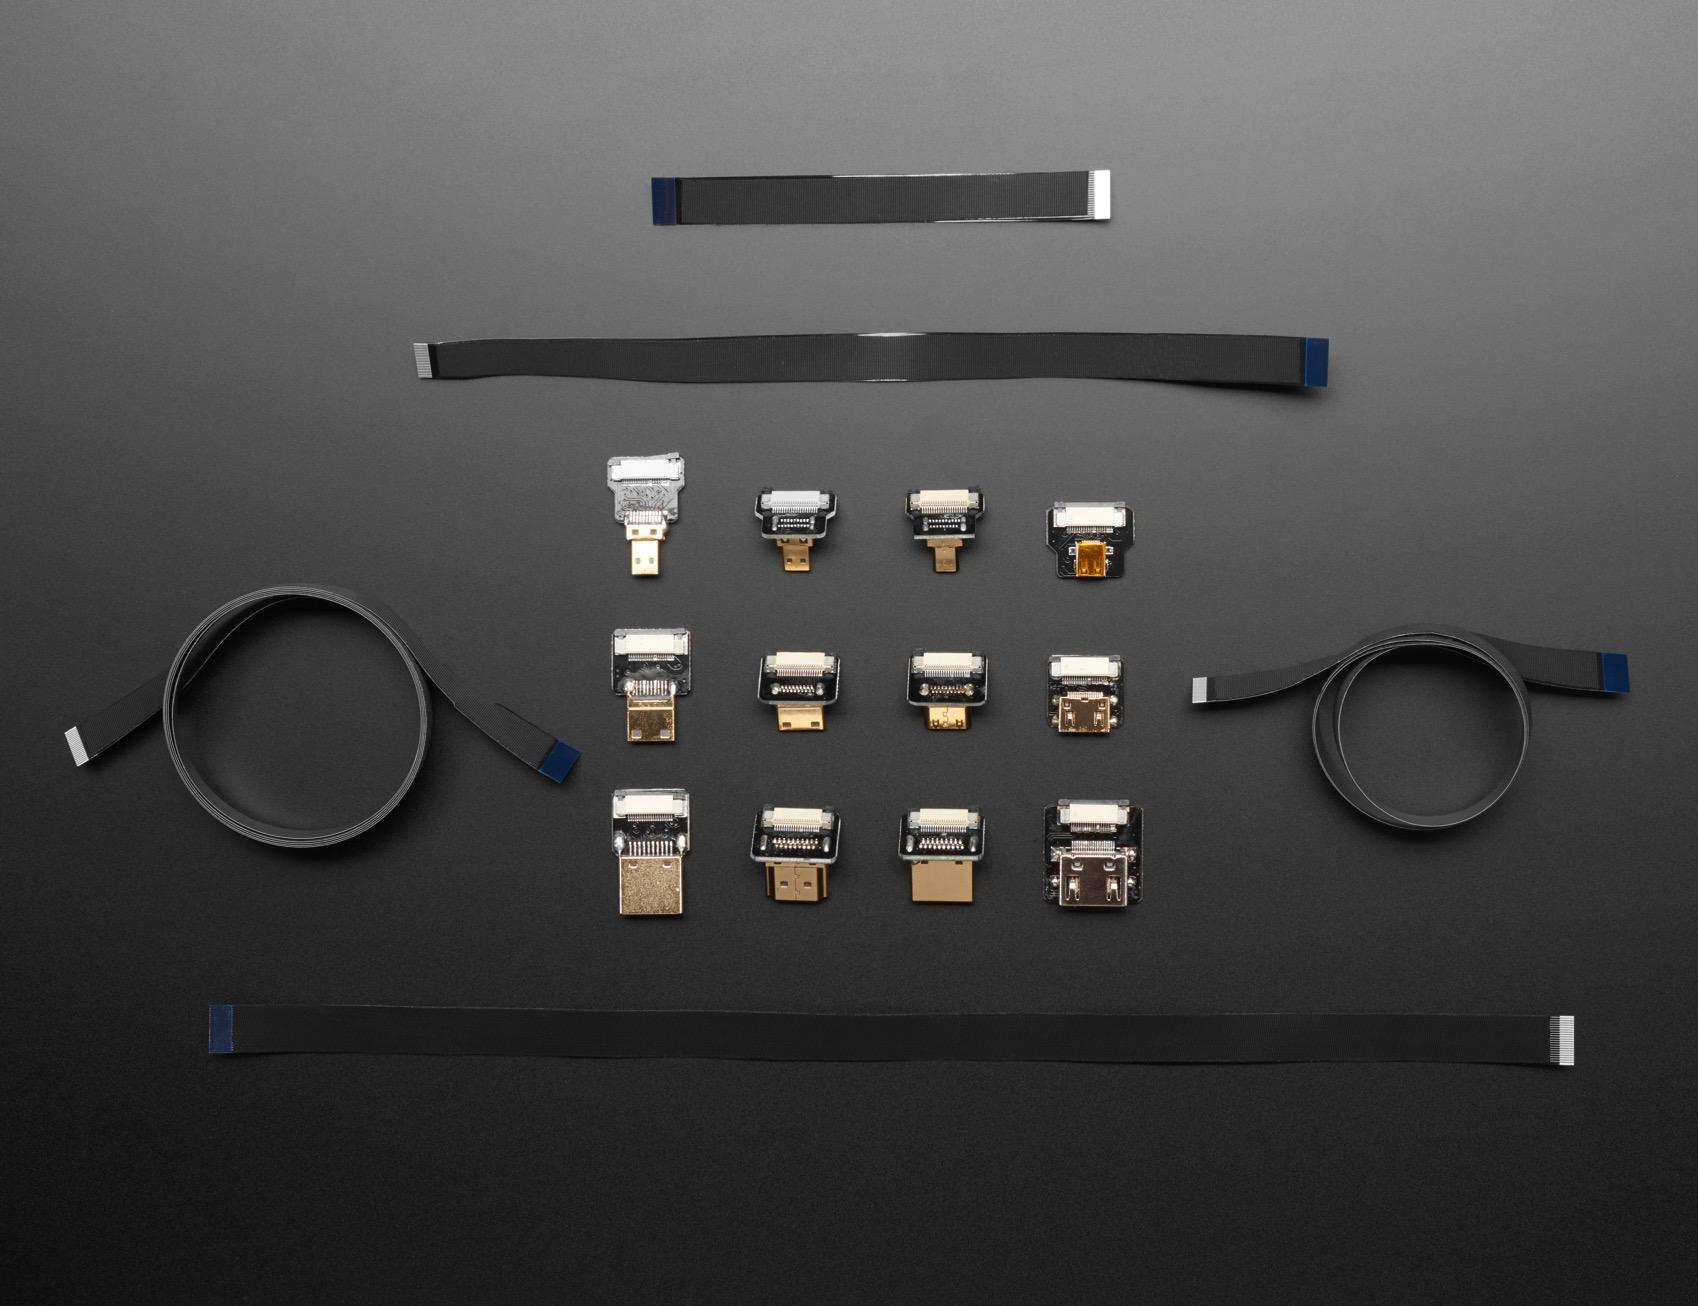 HDMI DIY Cables Connectors Group Photo ORIG